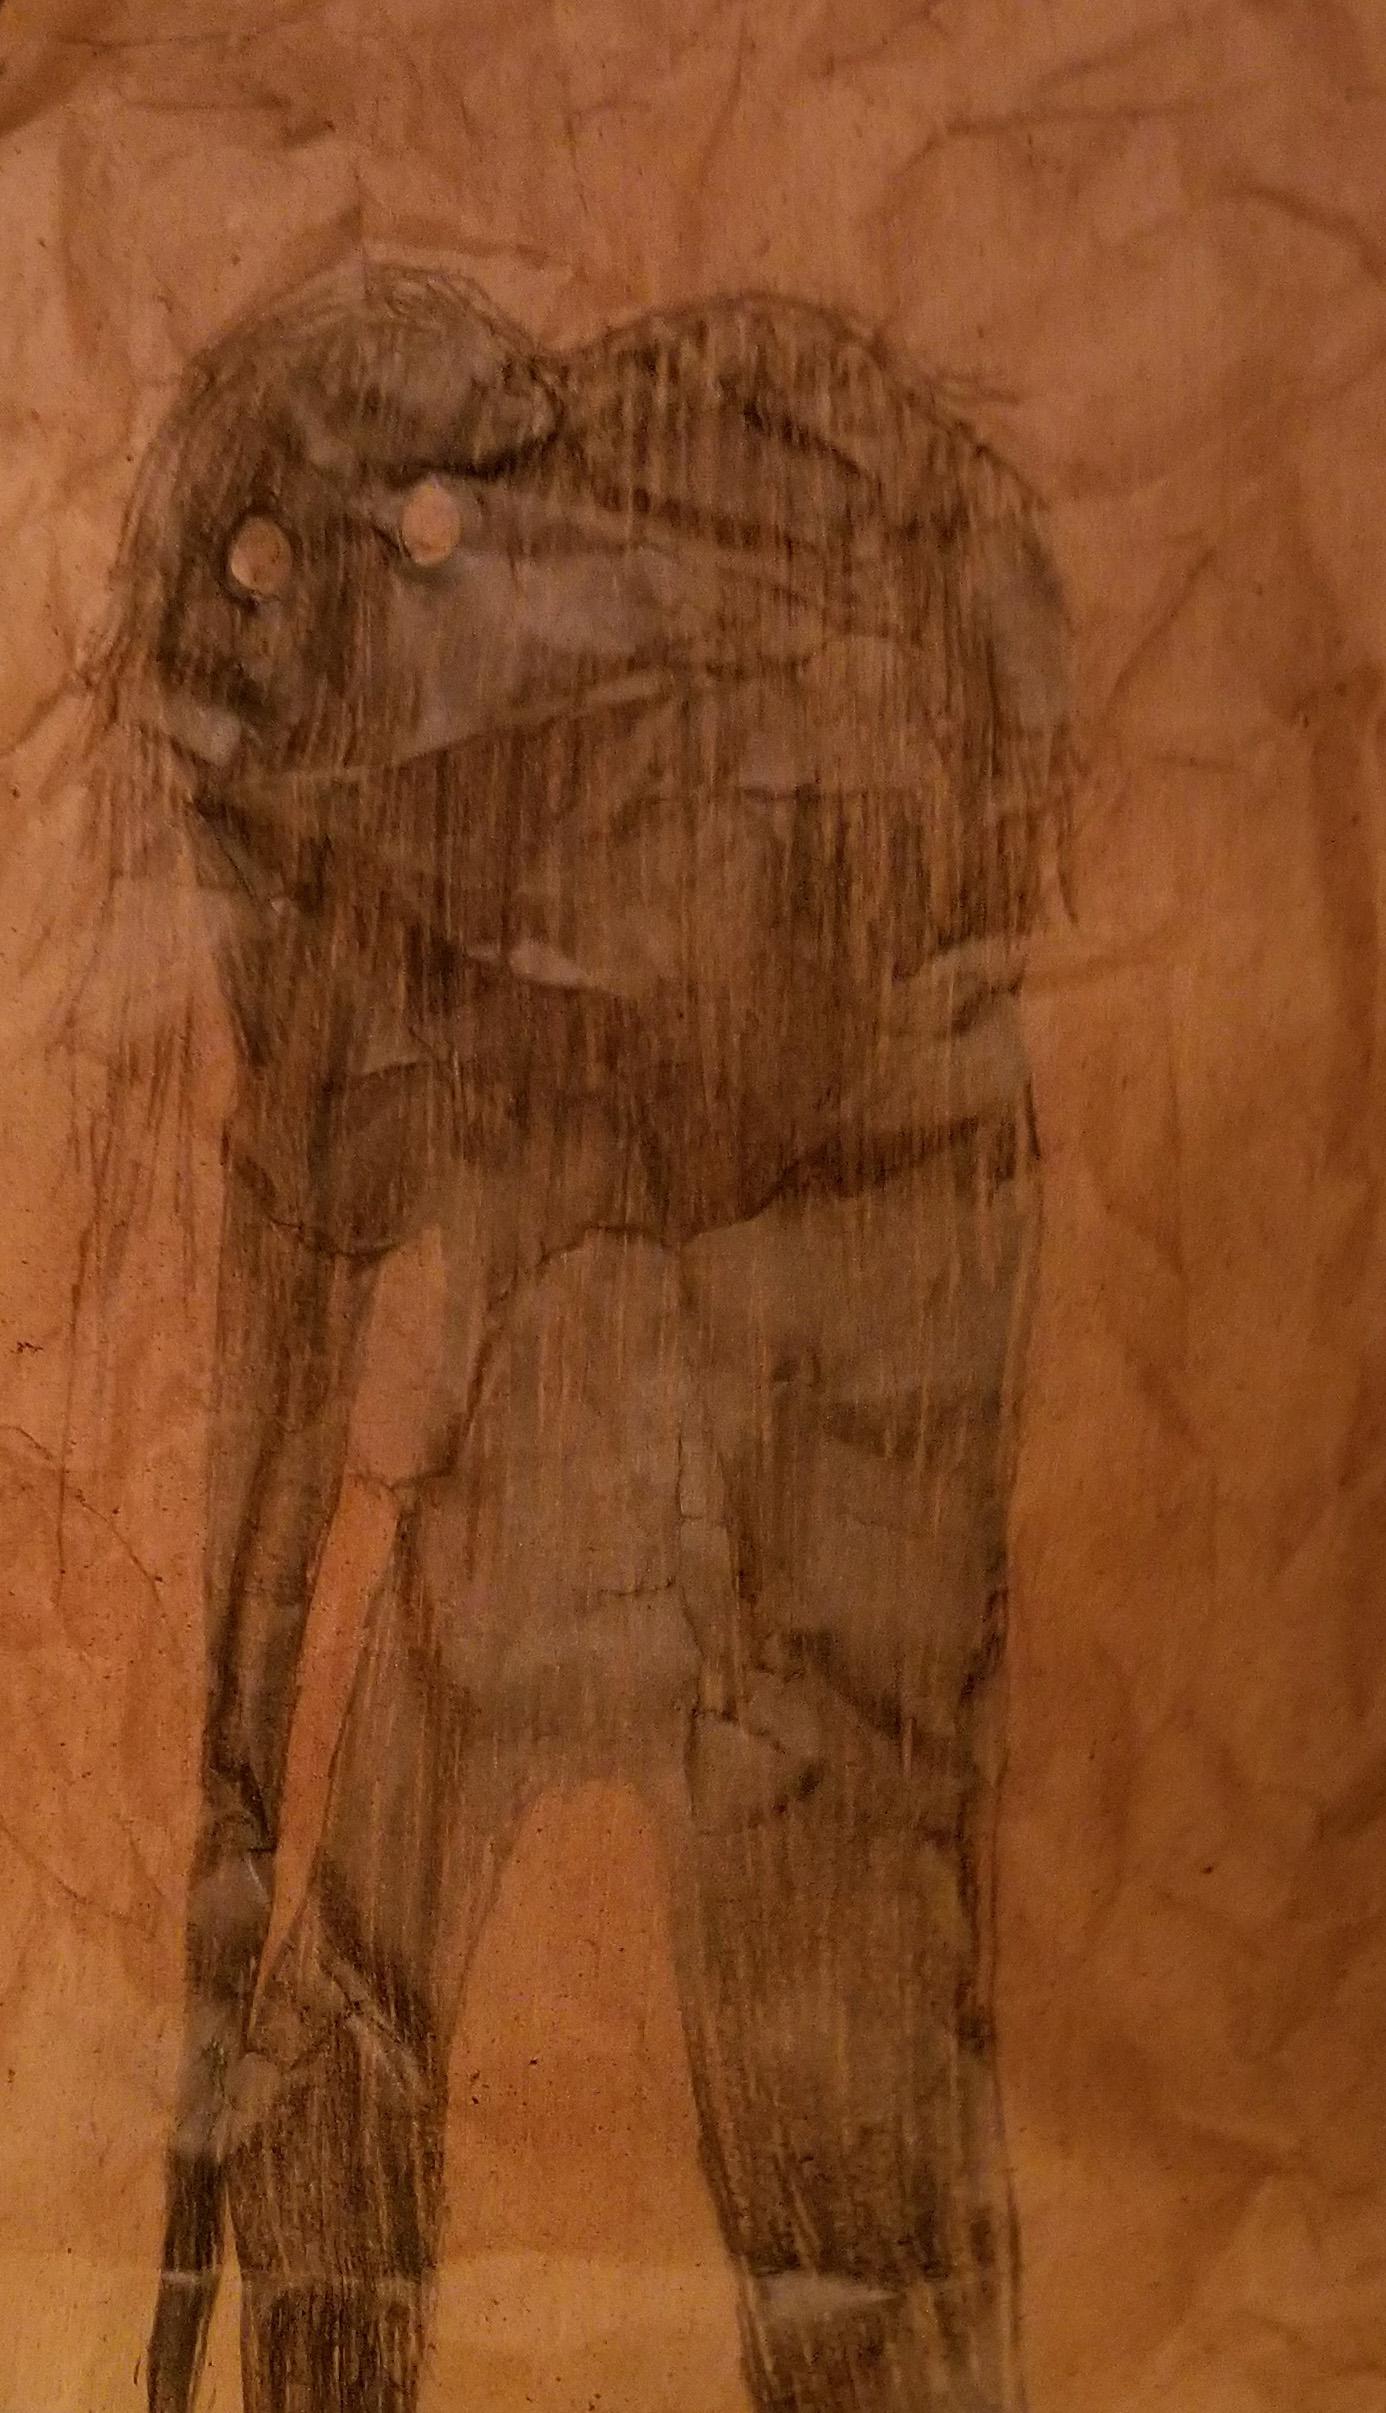 David's Sketch